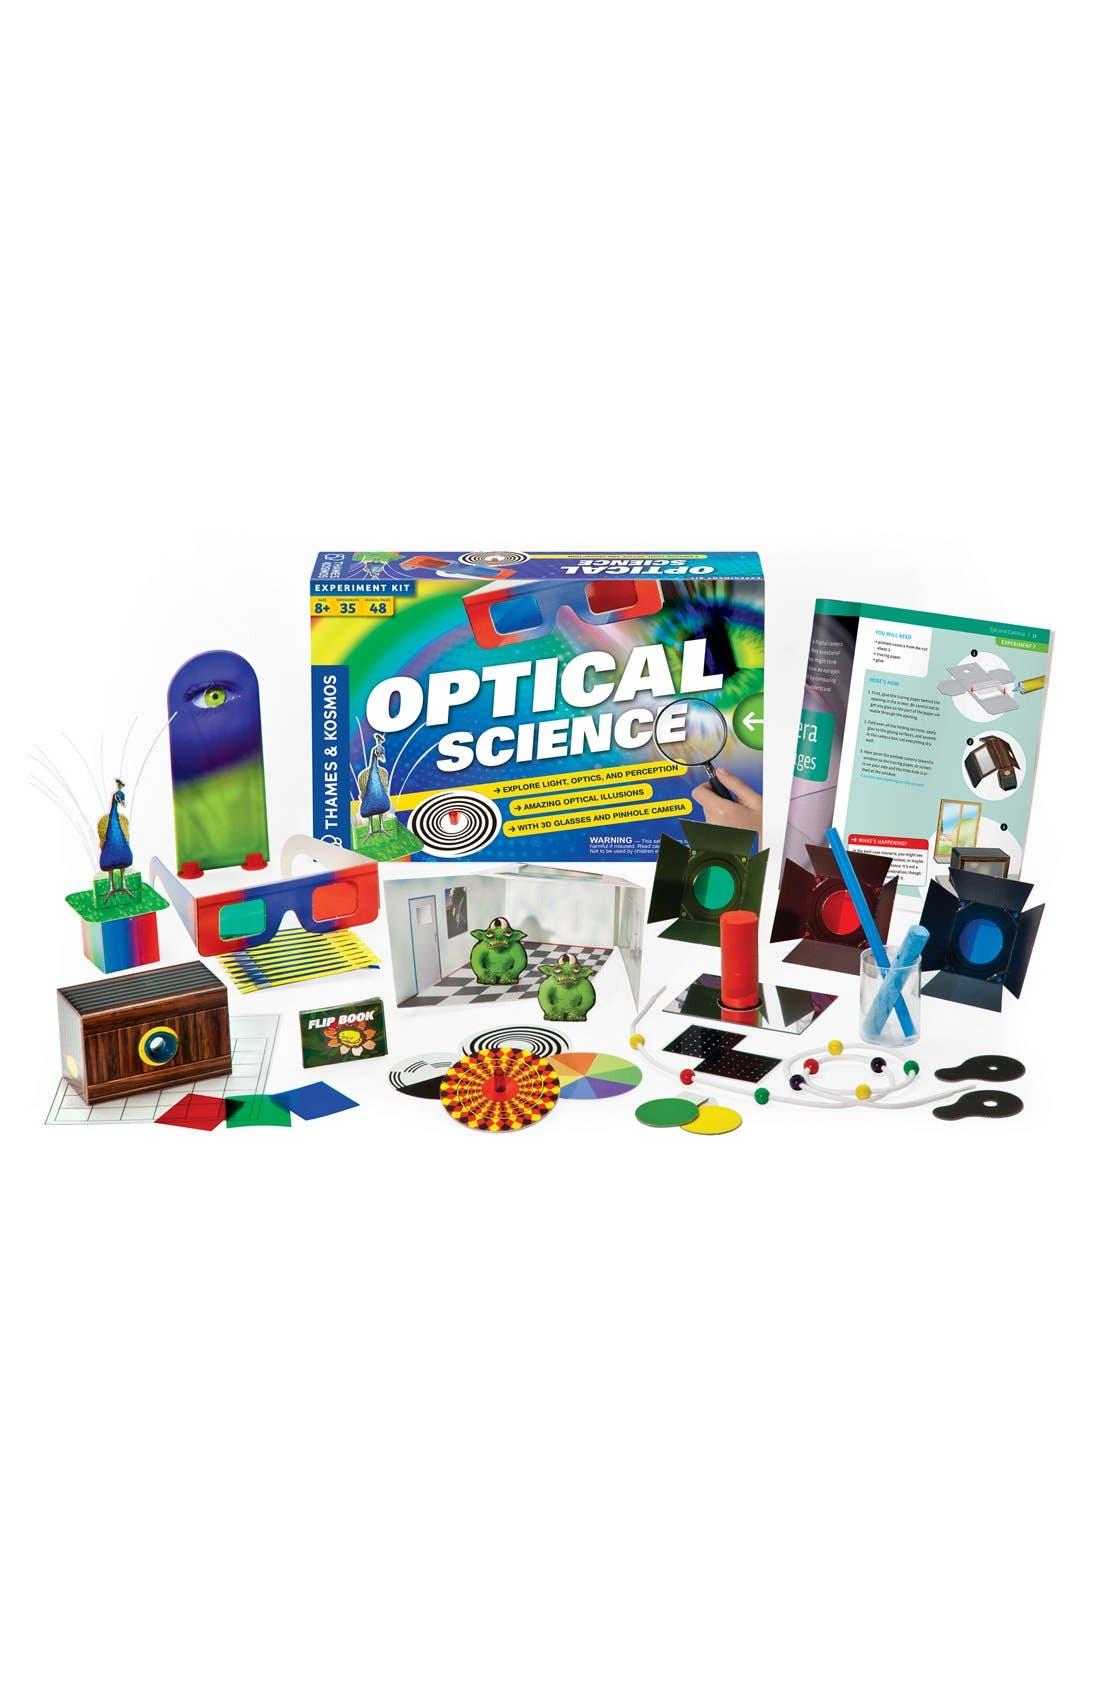 'Optical Science 2.0' Experiment Kit,                             Main thumbnail 1, color,                             000